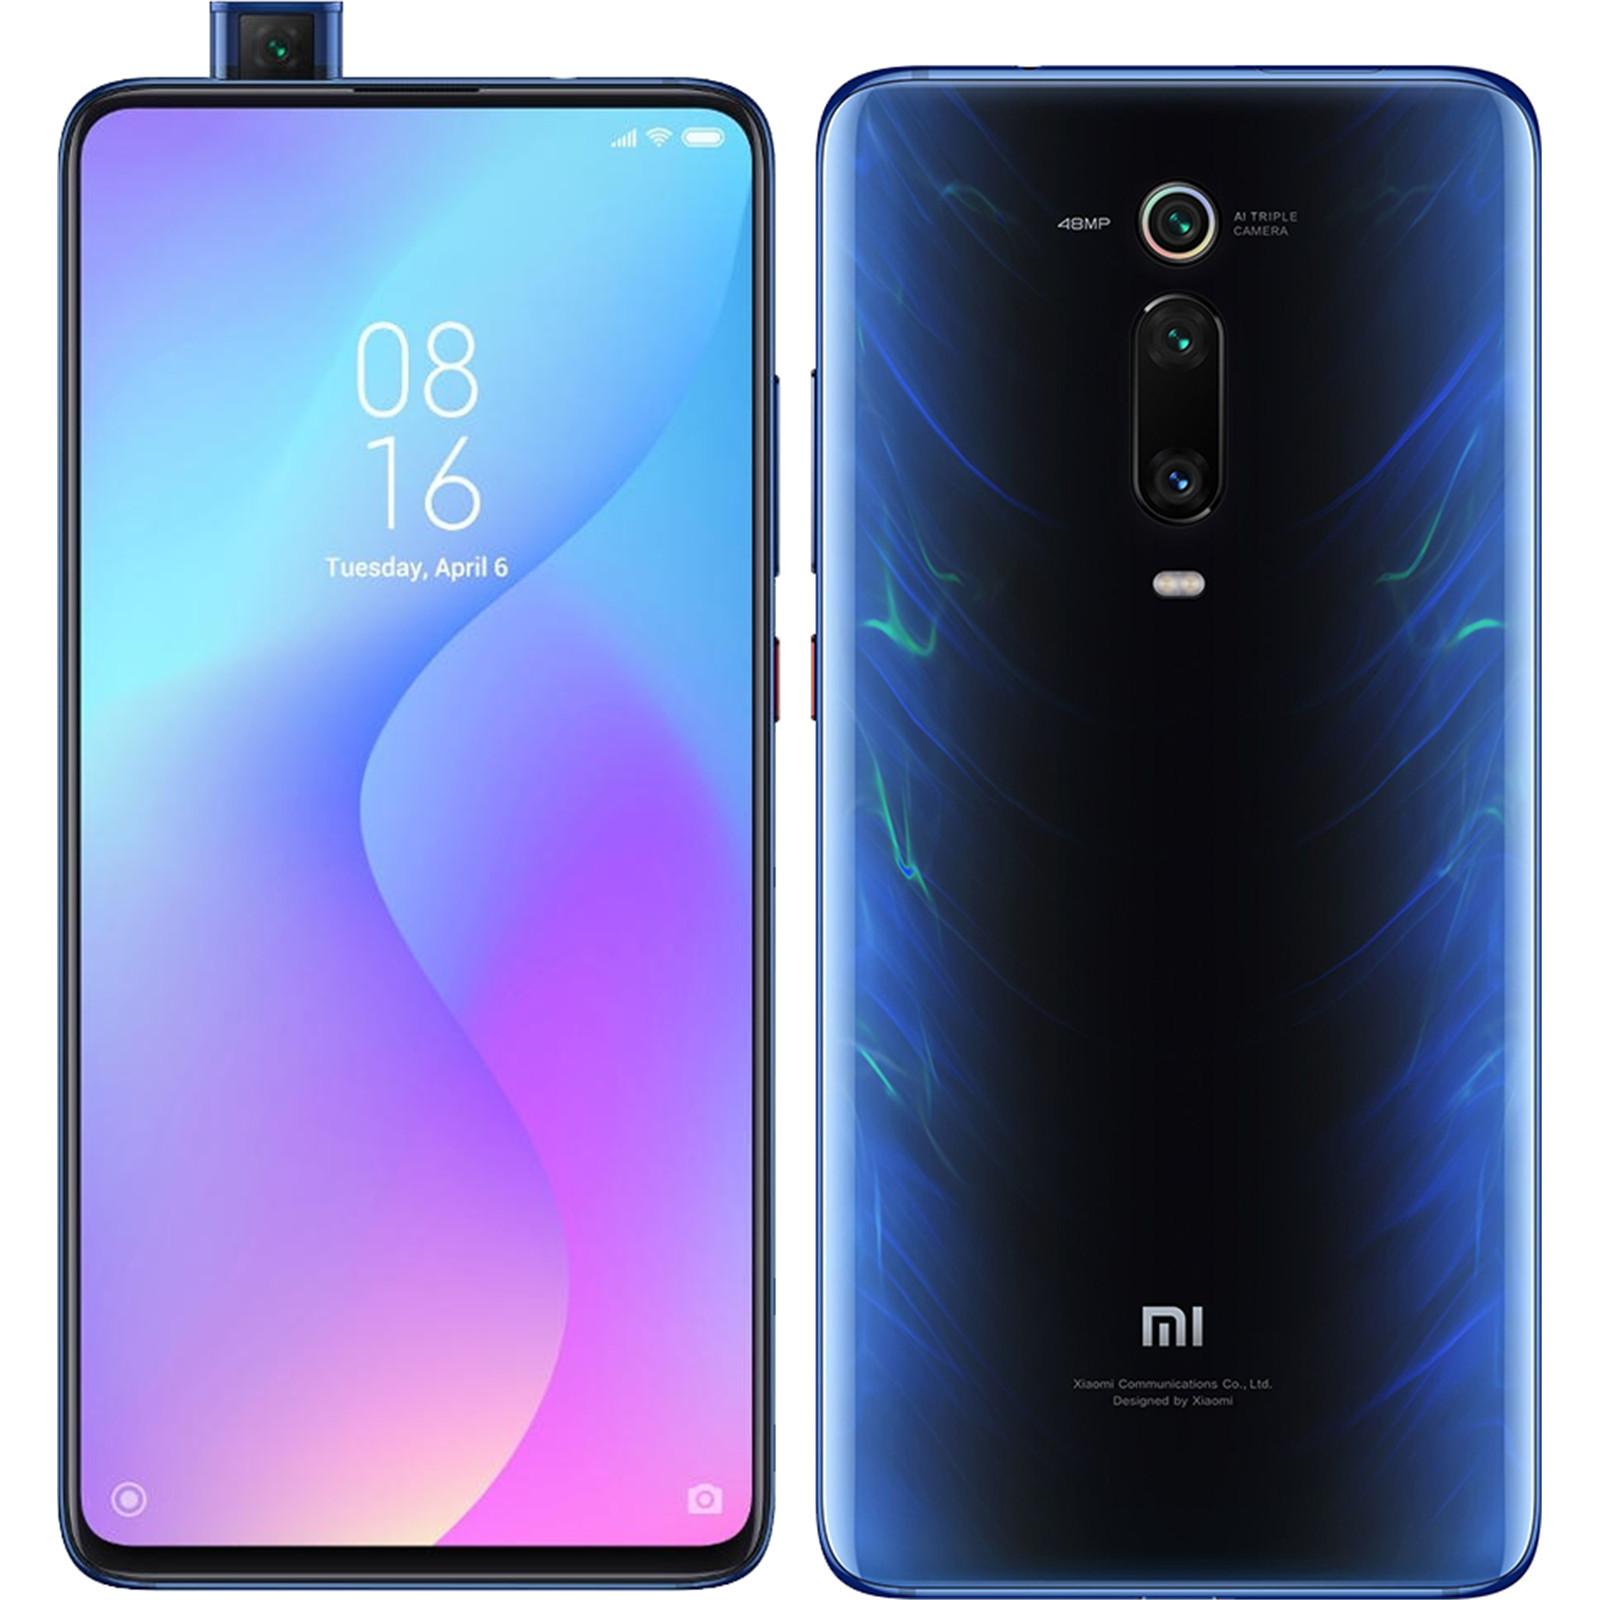 Xiaomi: Mi 9T (K20) Dual SIM Smartphone - Glacier Blue/6GB+128GB image